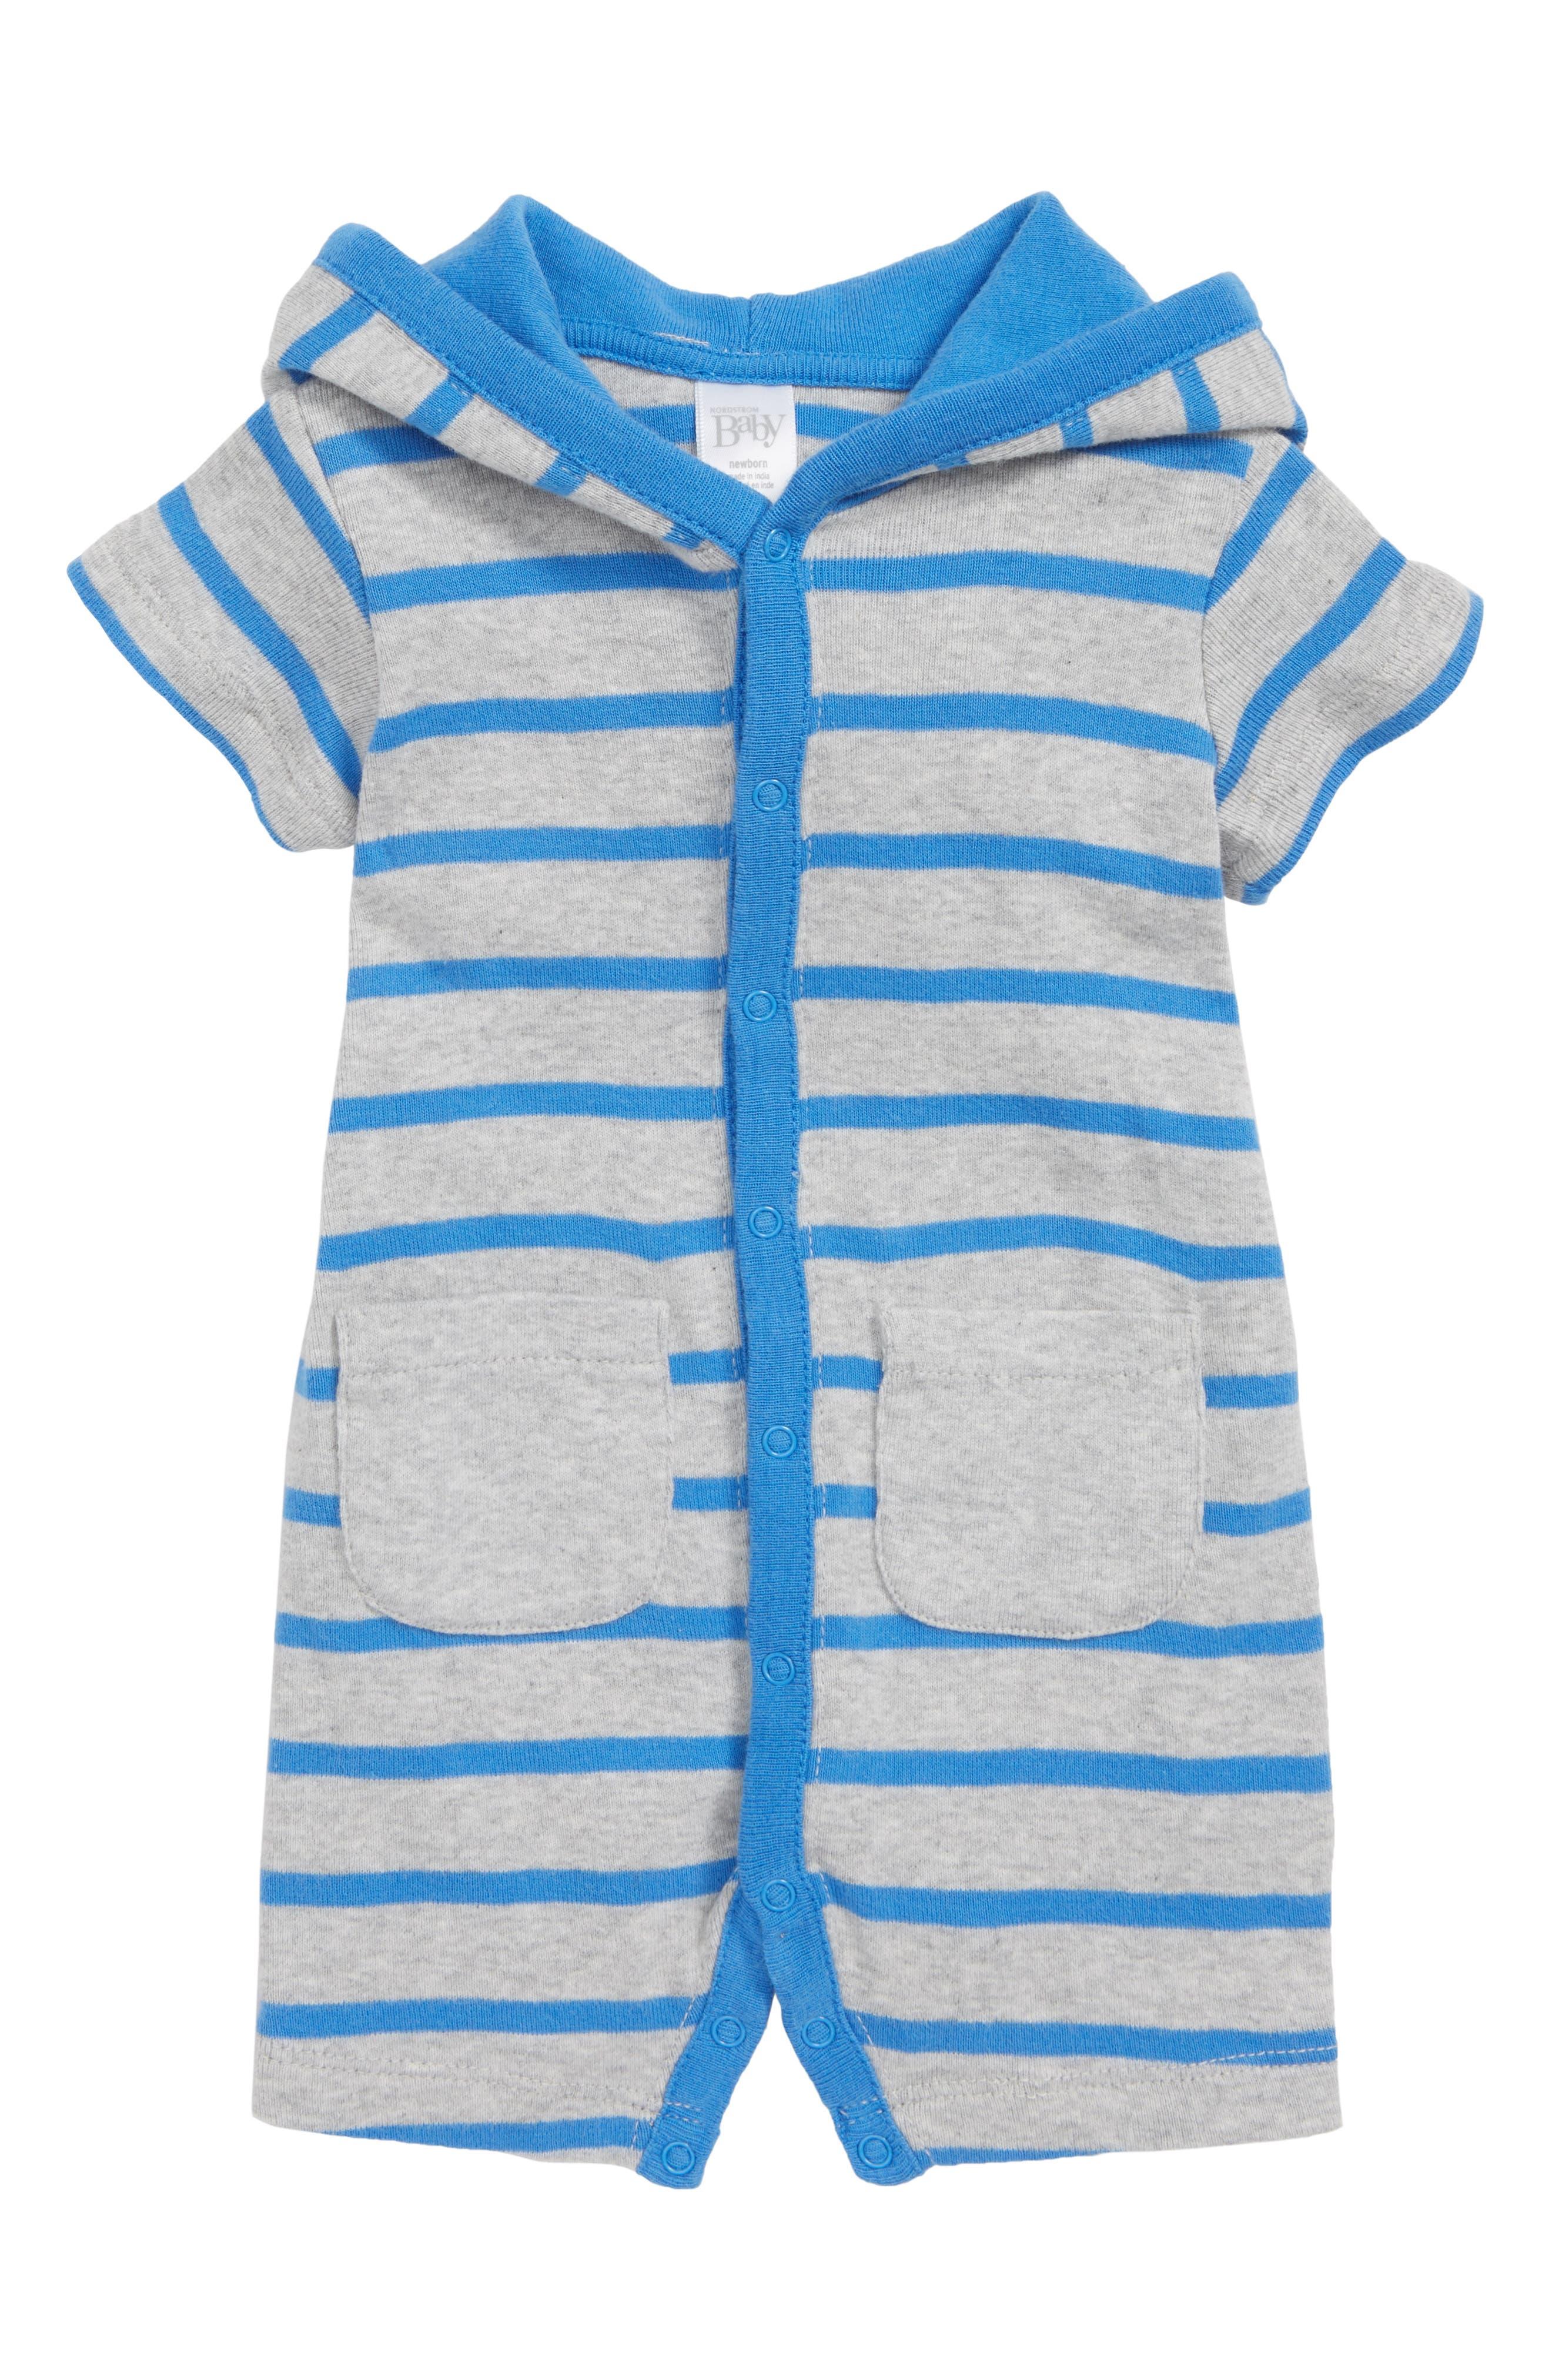 NORDSTROM BABY,                             Stripe Hooded Romper,                             Main thumbnail 1, color,                             451